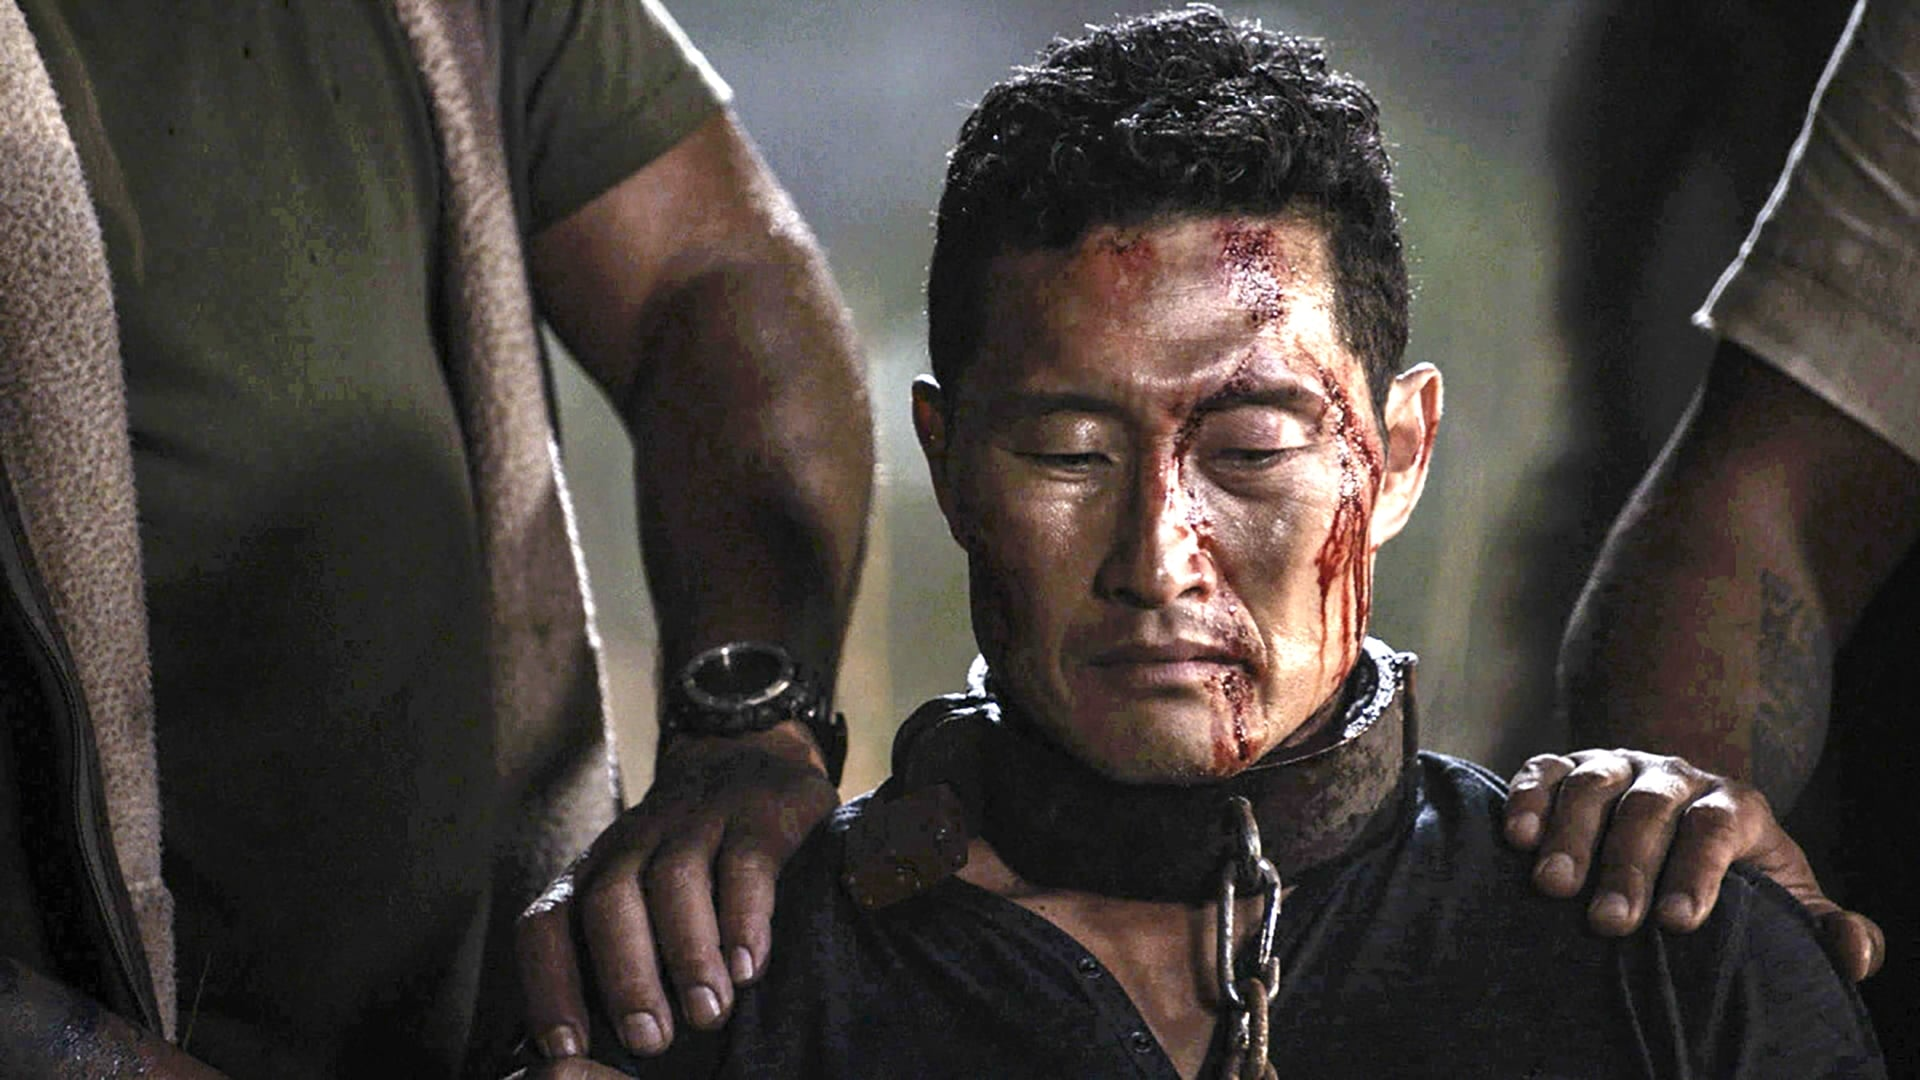 Hawaii Five-0 - Season 7 Episode 12 : Ka 'aelike (The Deal)